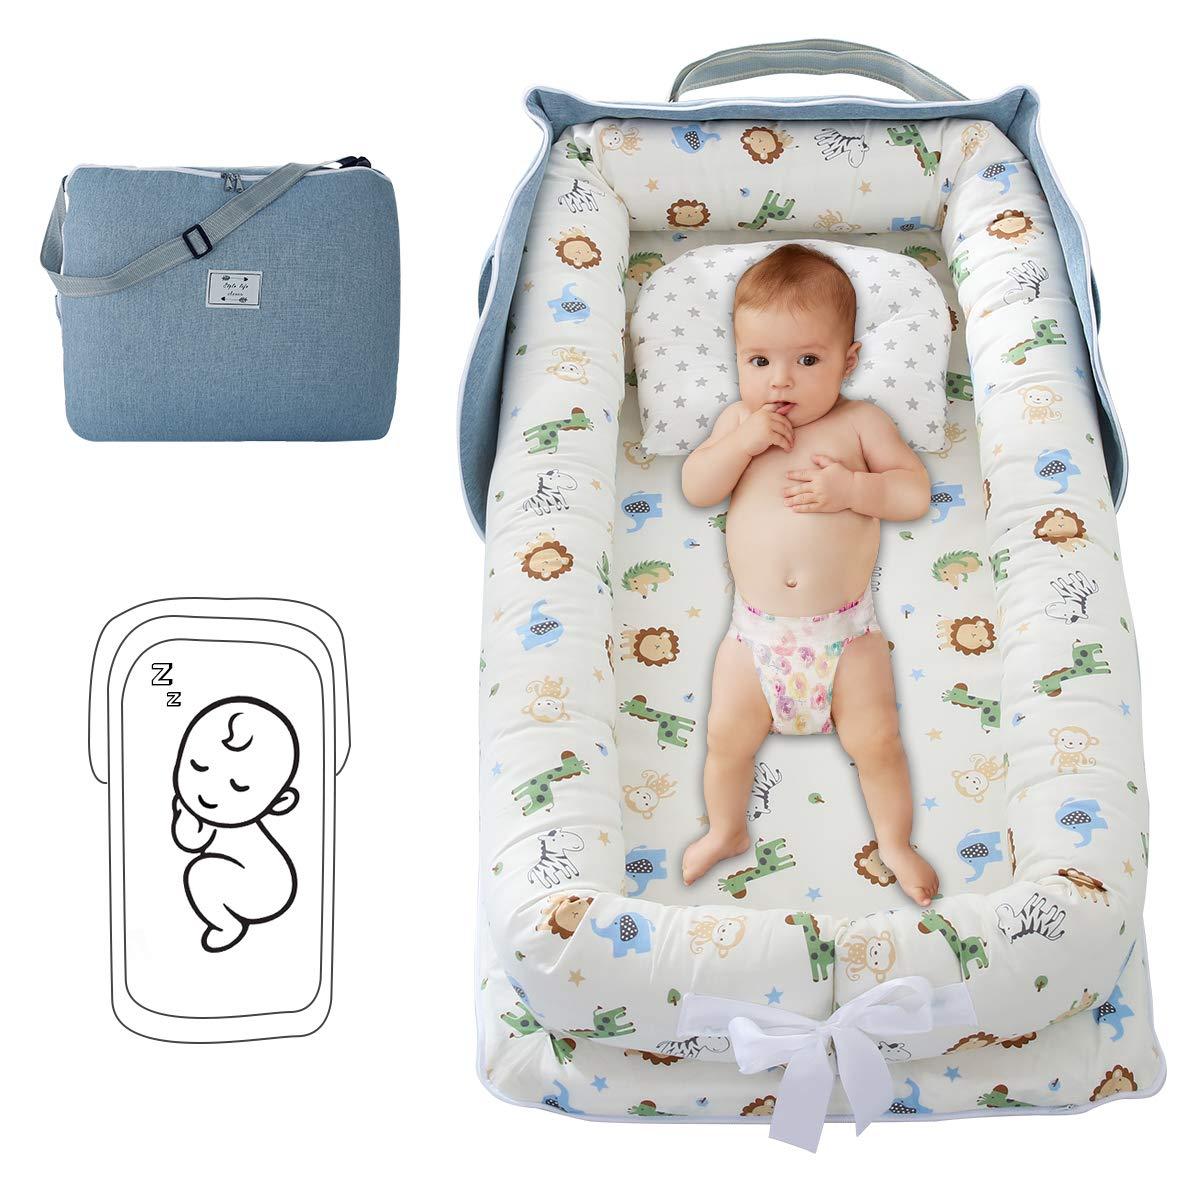 topseller-hzy Baby Recliner Foldable Portable Newborn Bed, Suitable for Outdoor Indoor